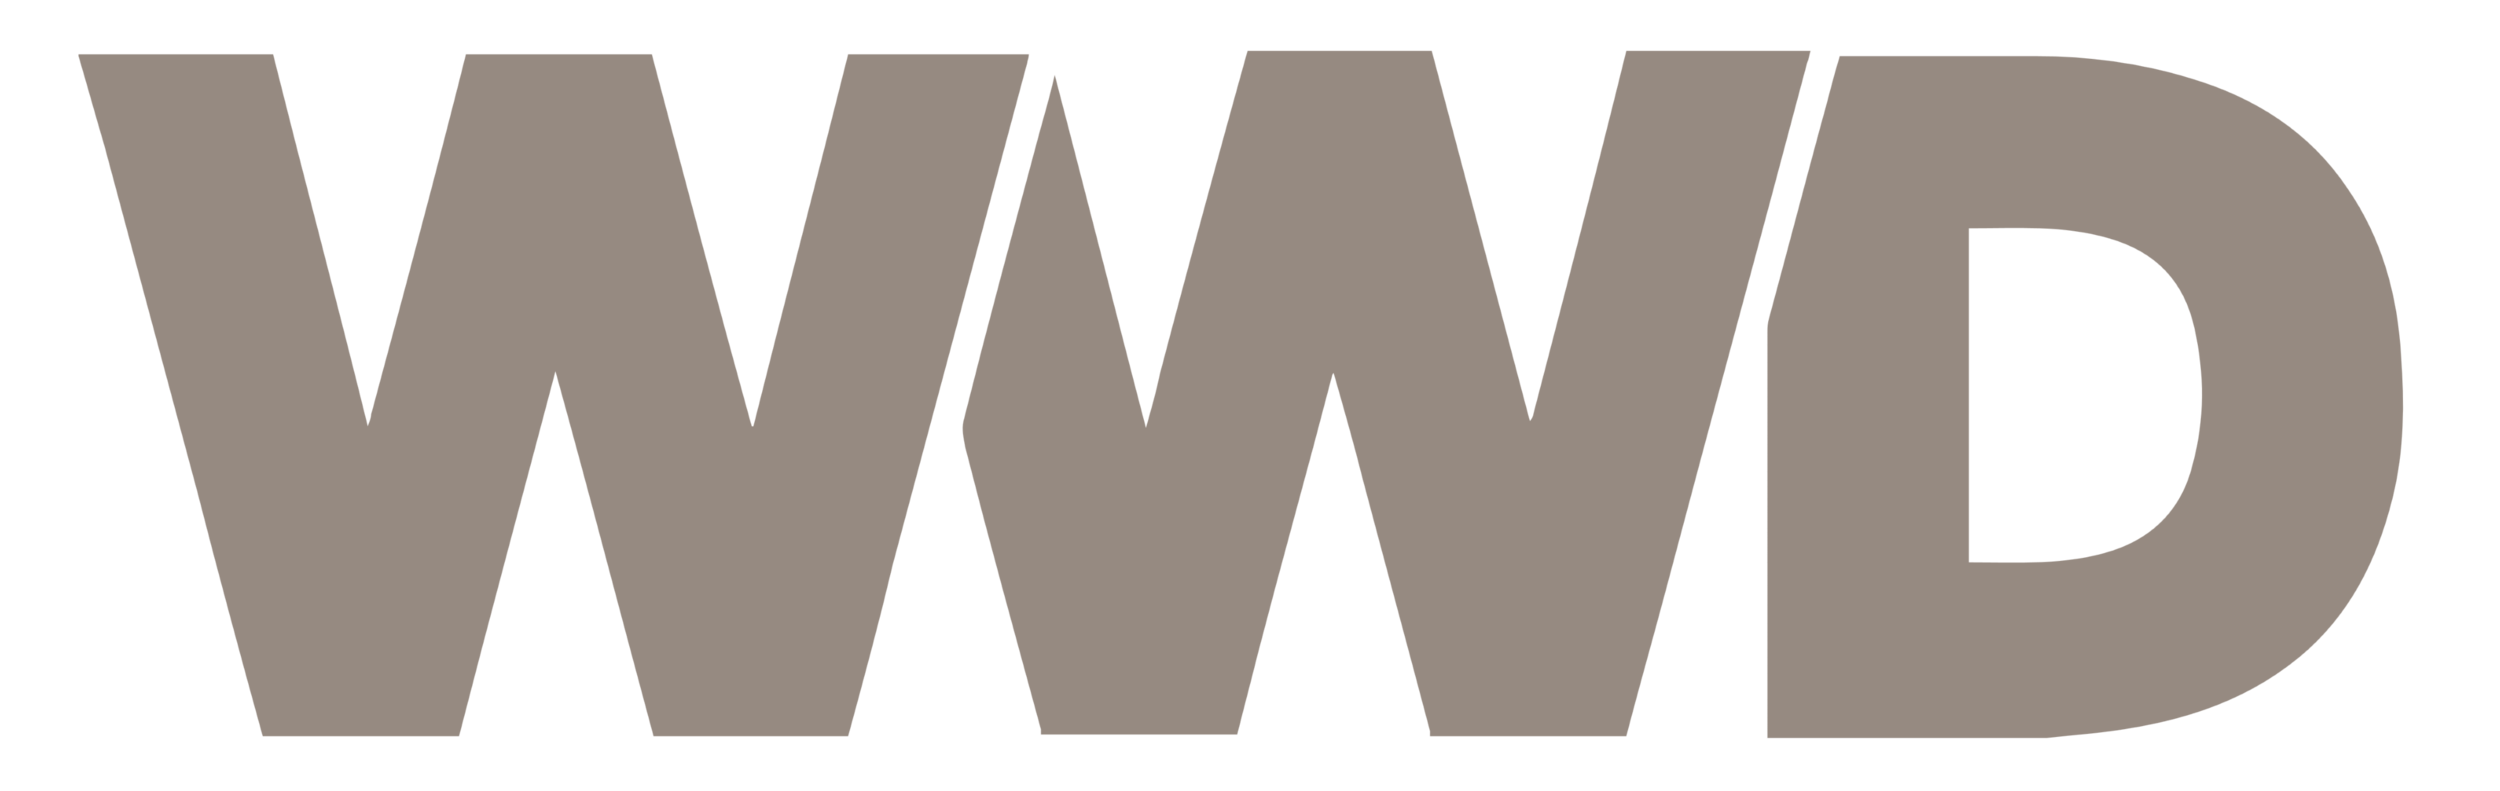 WWD_logo_brown.png